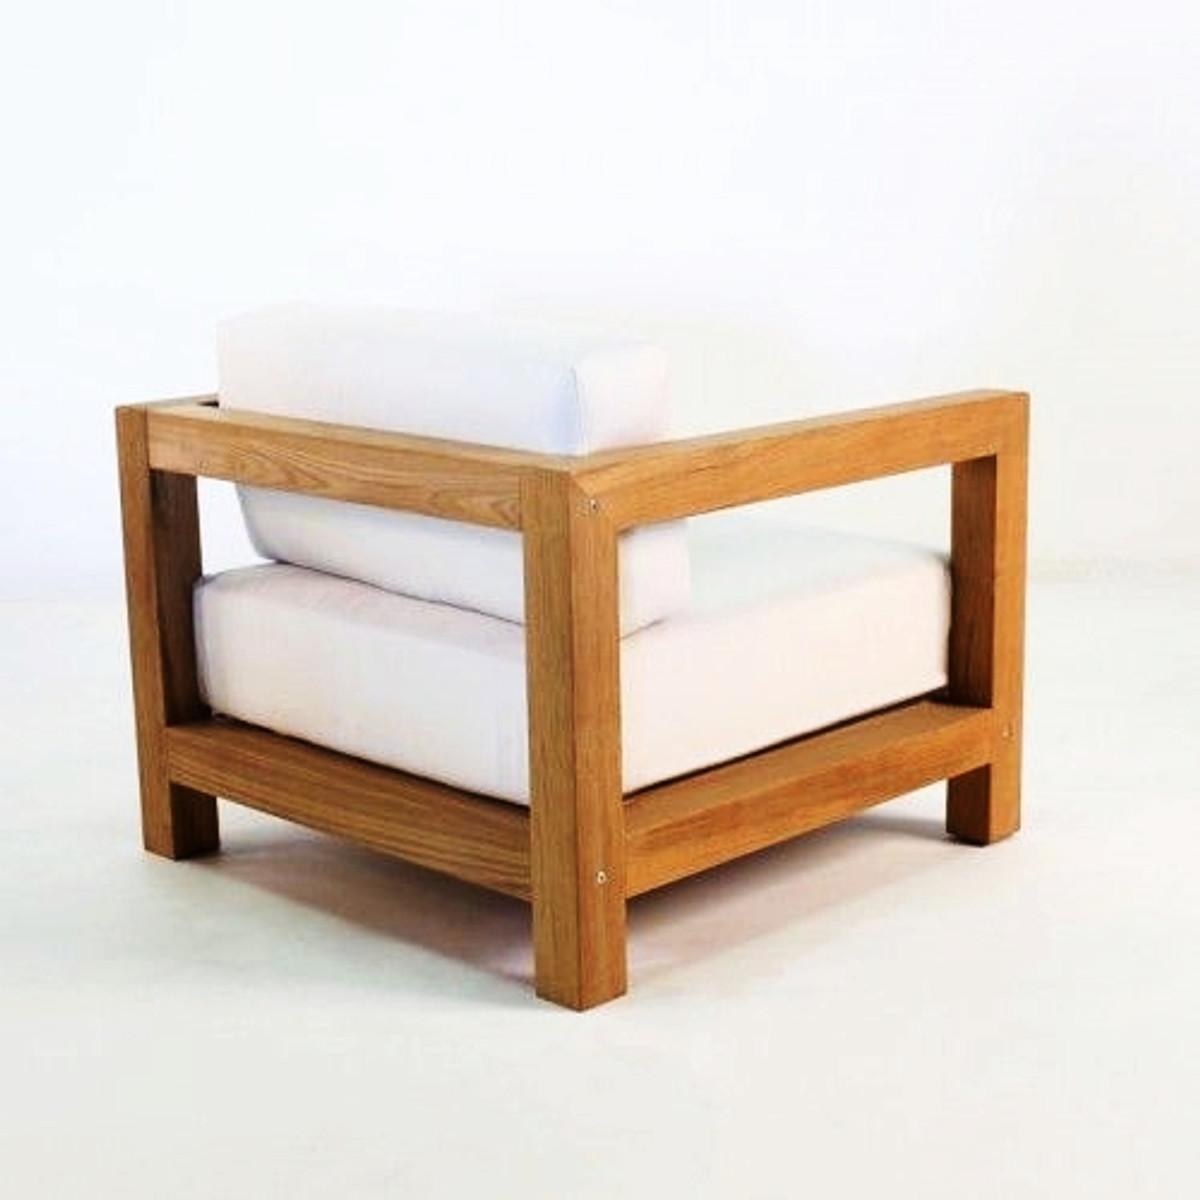 casa padrino garten sessel boston rustikal weiss creme. Black Bedroom Furniture Sets. Home Design Ideas